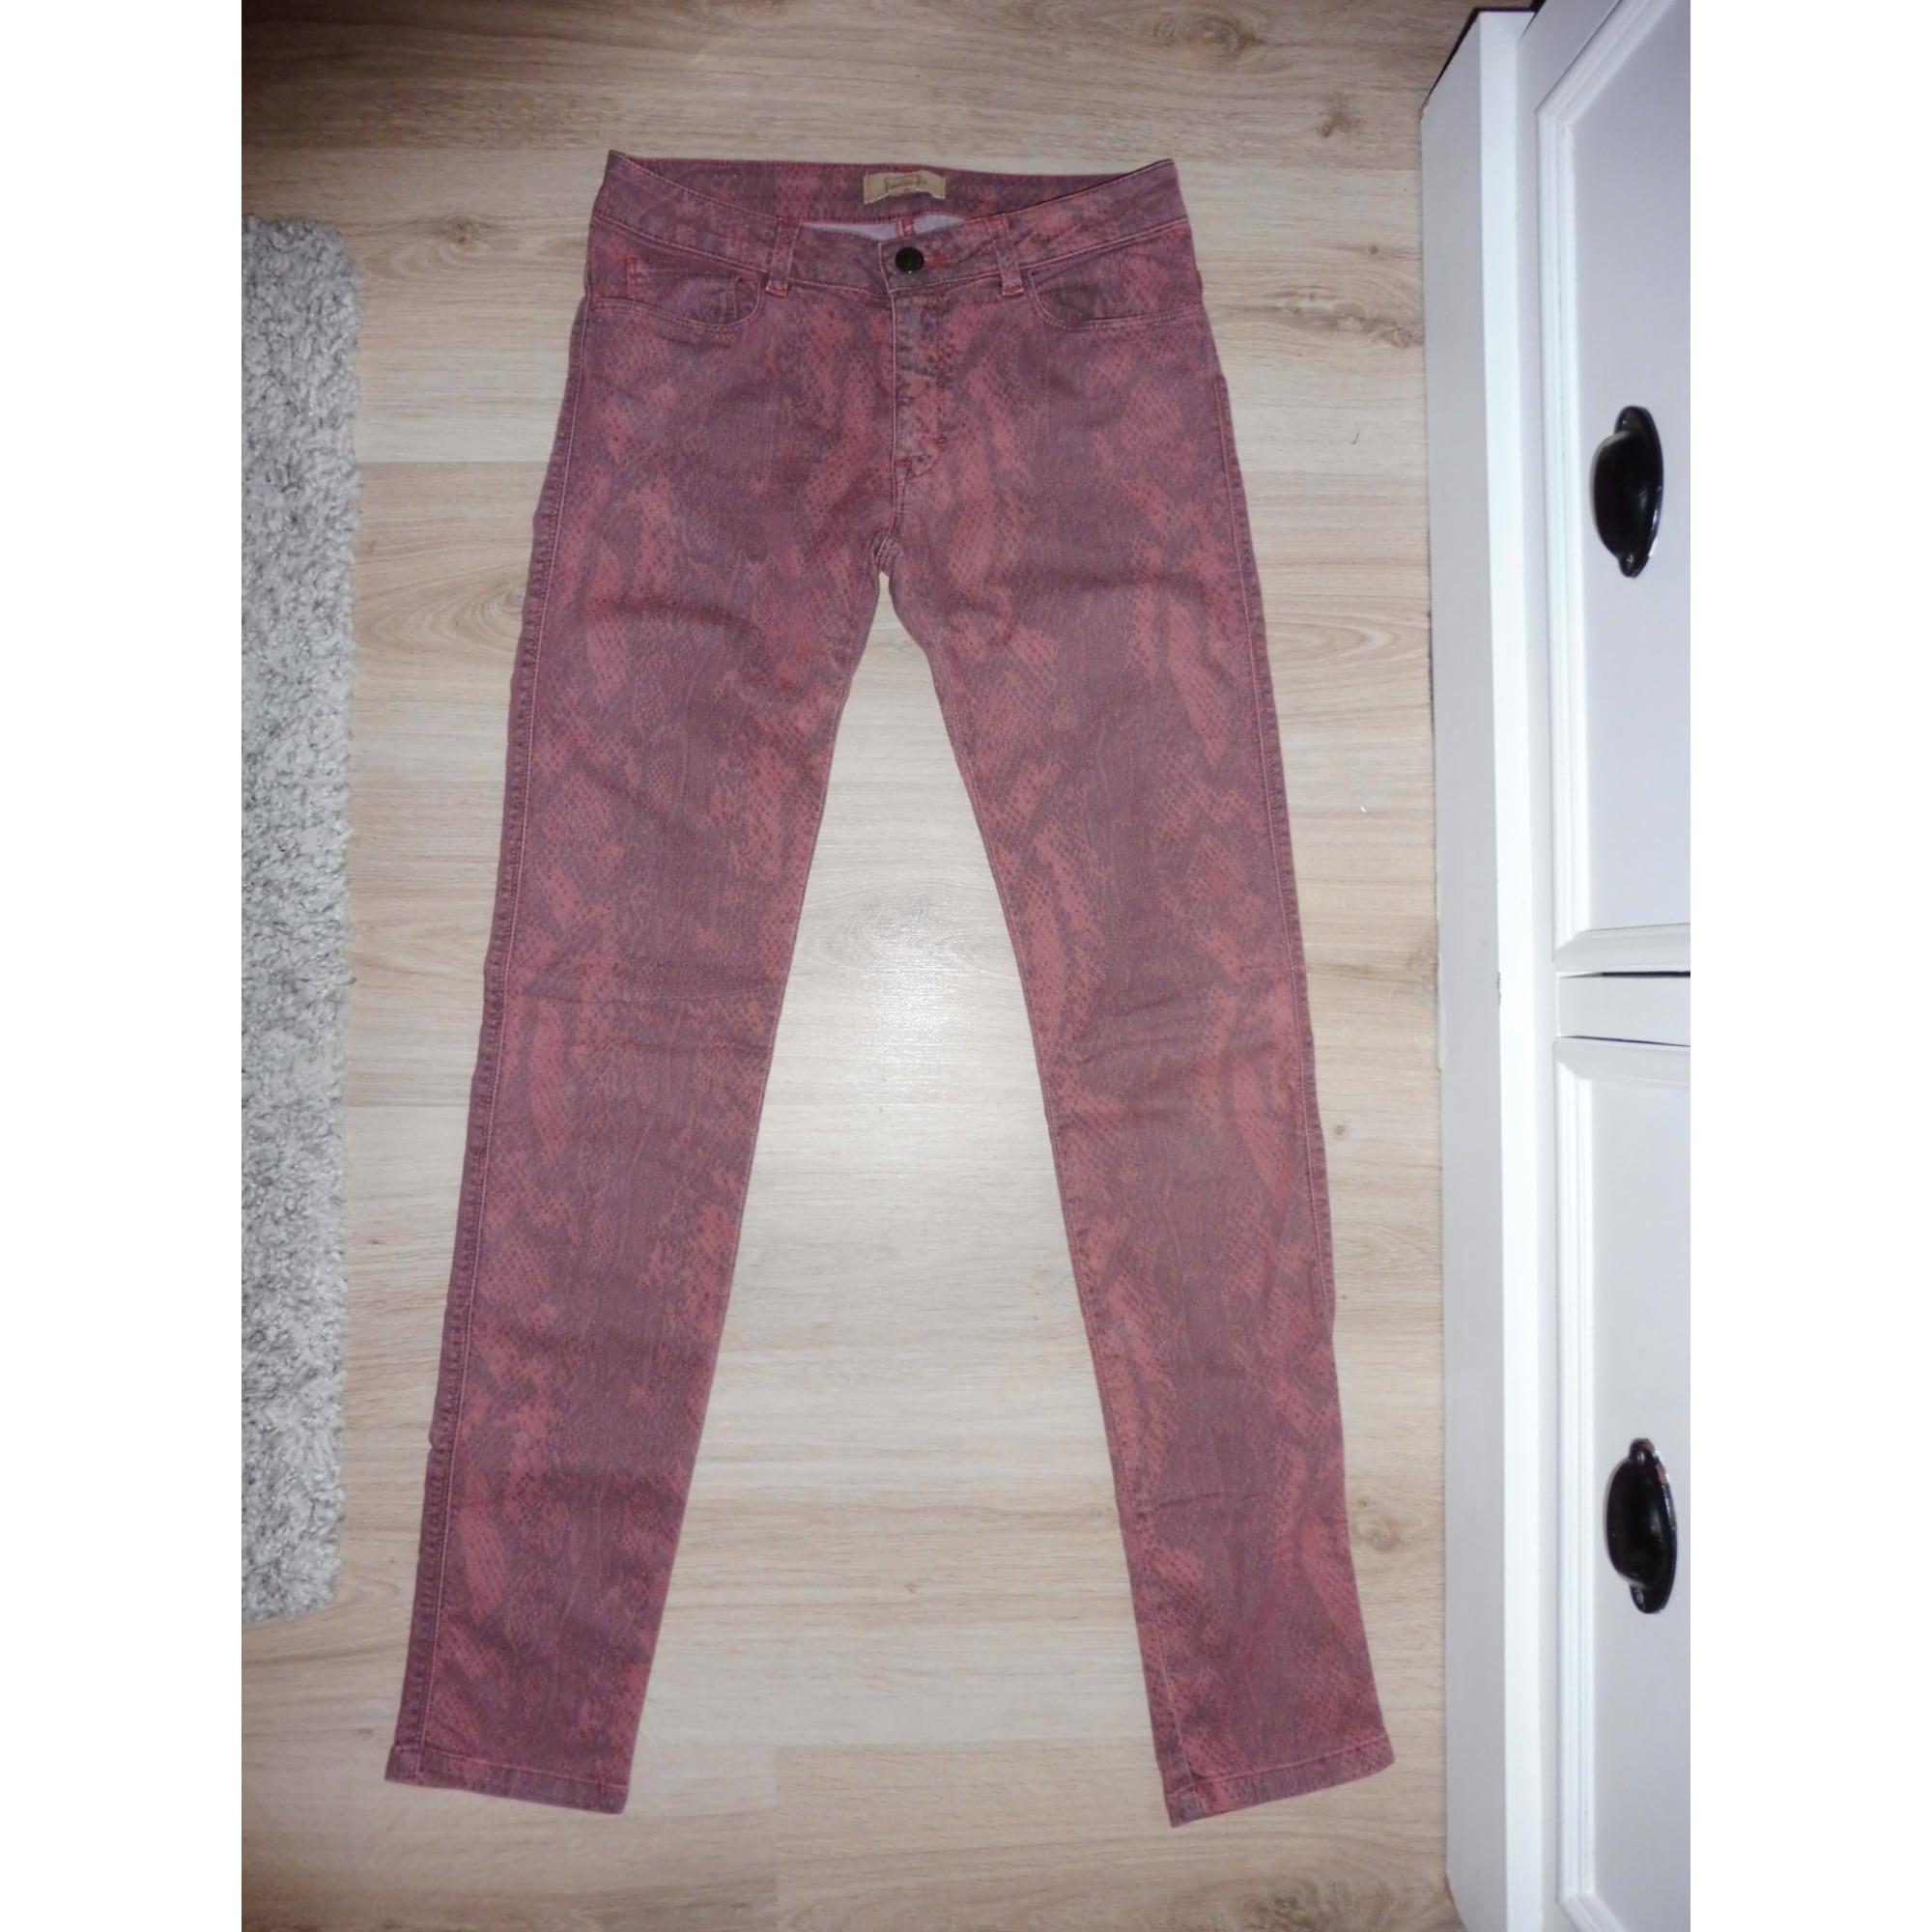 Jeans slim BEL AIR Python rouge clair